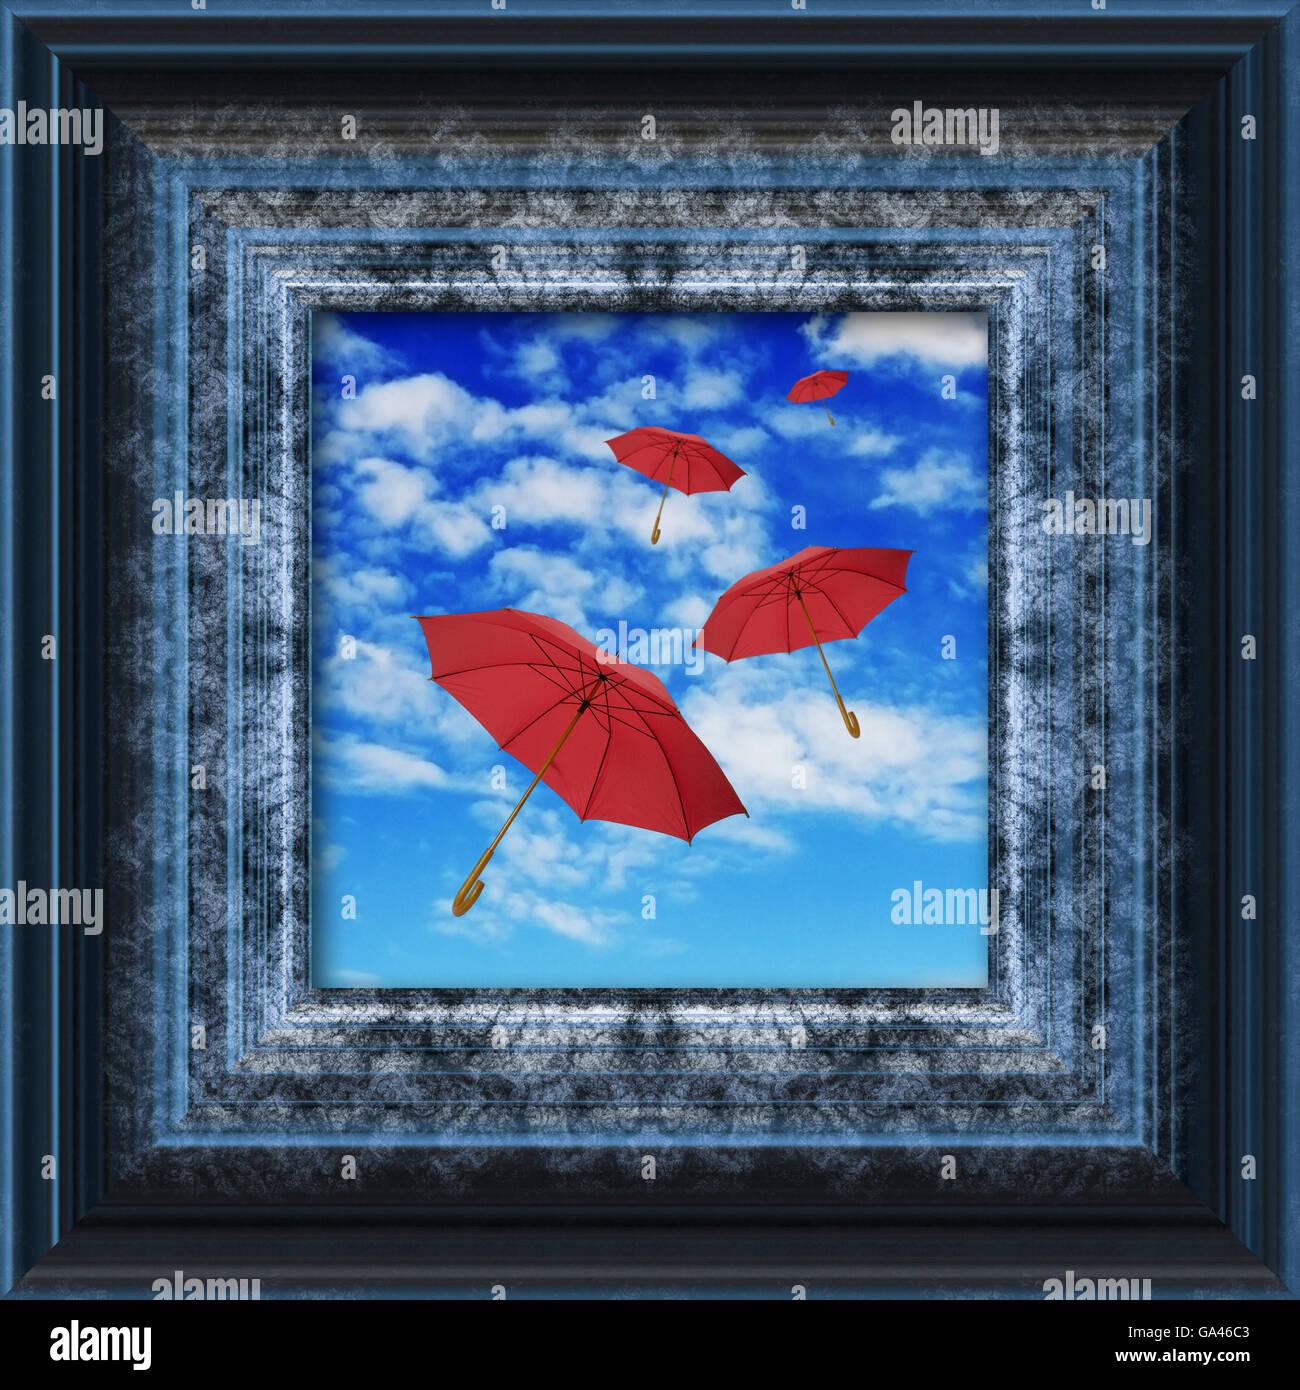 rote Schirme fliegen in den Himmel in einen digitalen Bilderrahmen Stockbild